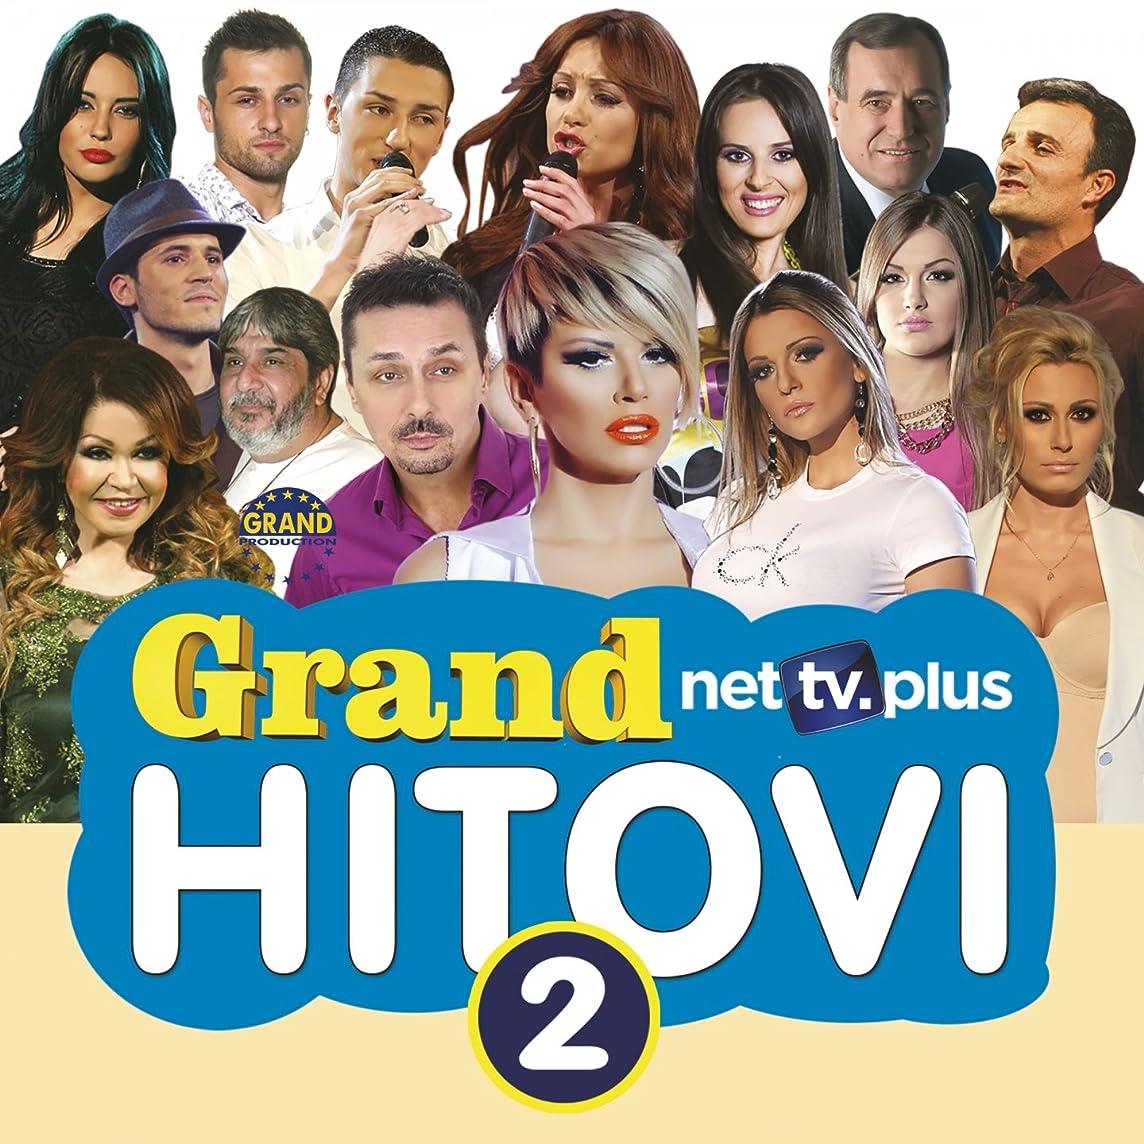 Grand Nettv.plus Hitovi, Vol. 2